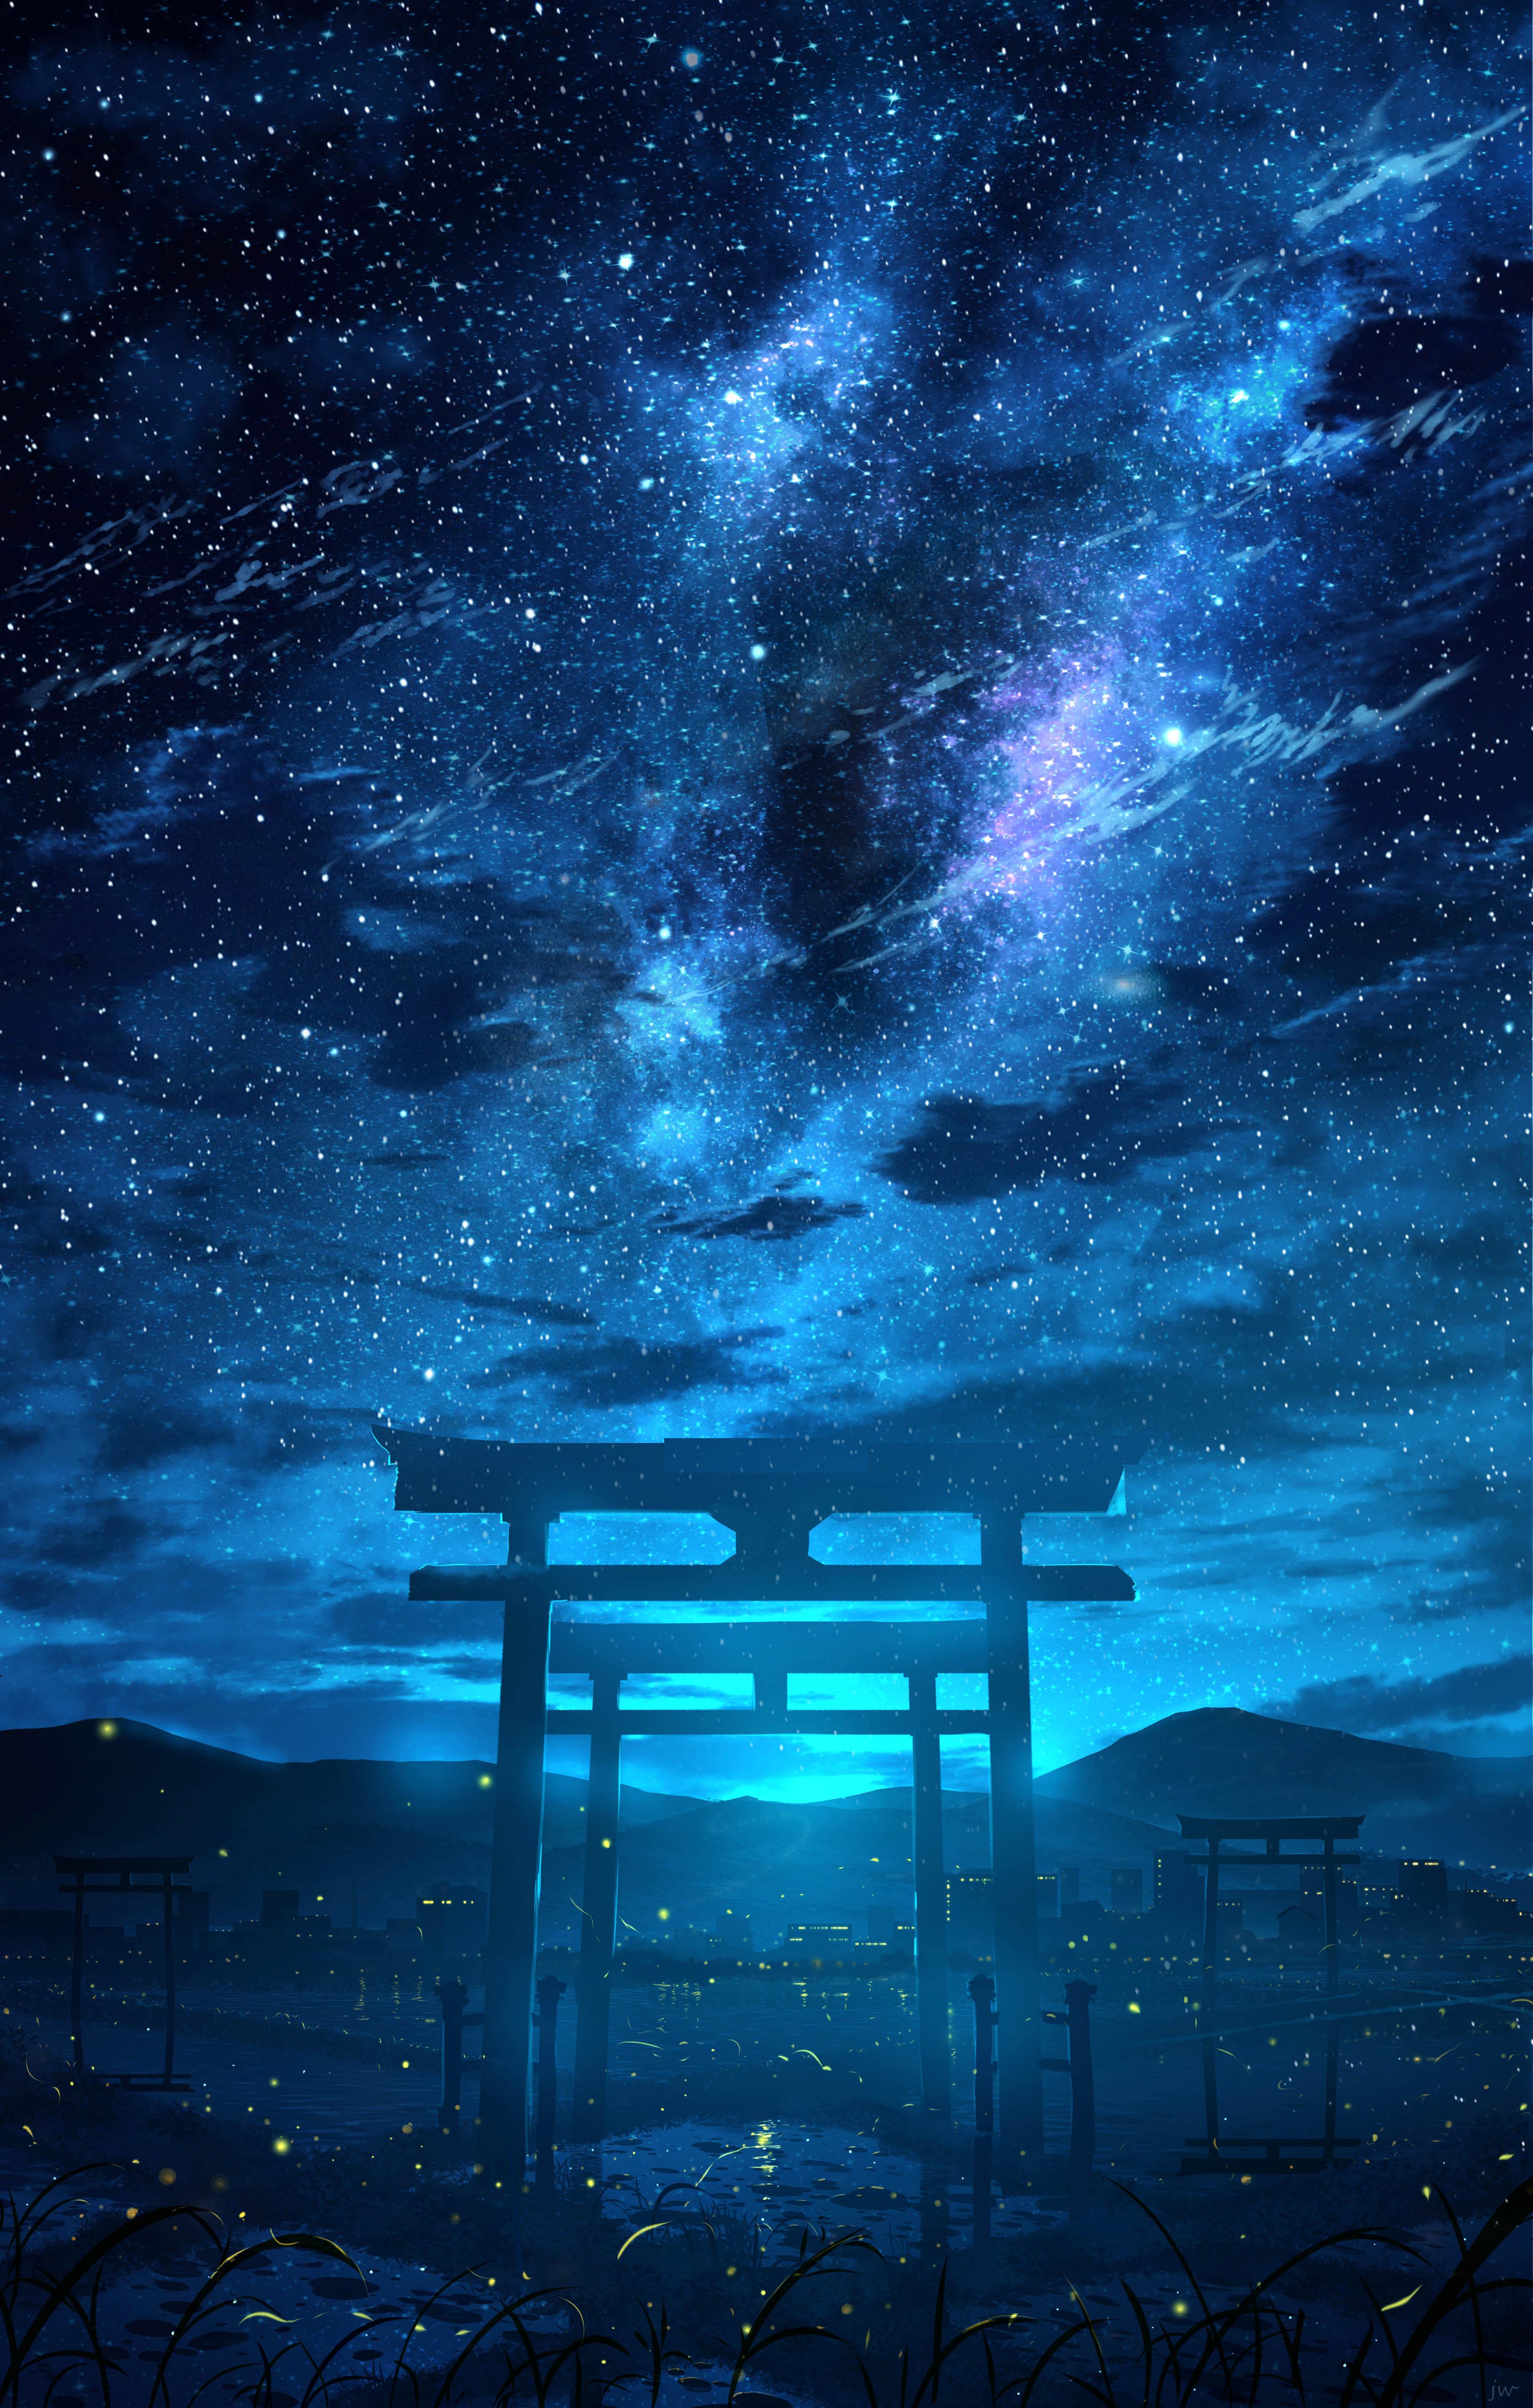 Anime 3453x5425 anime HuashiJW torii night sky